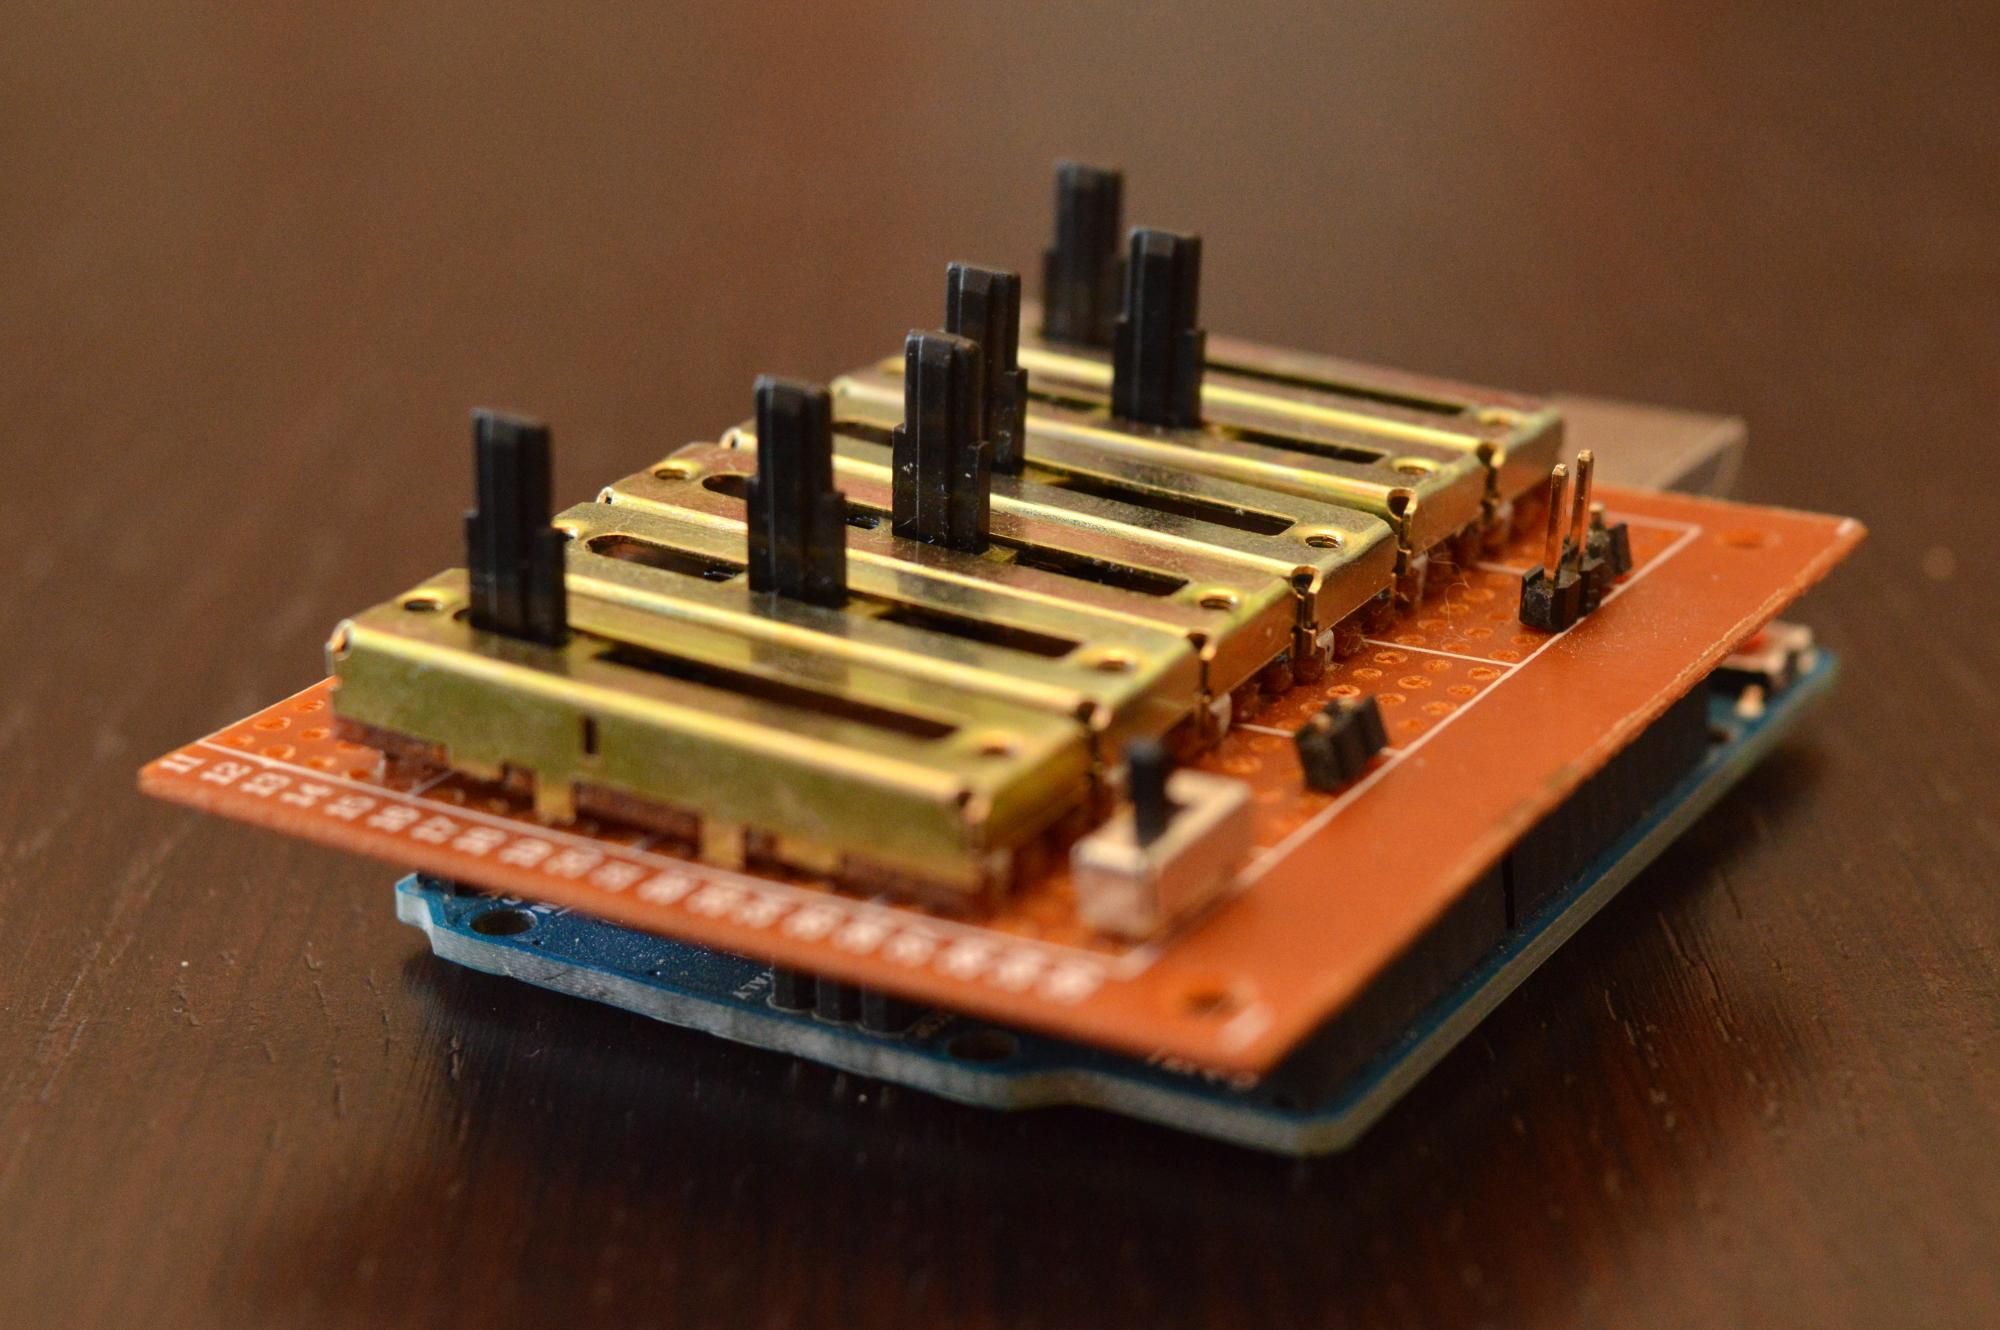 Arduino Step Sequencer: How to program a step sequencer with Arduino